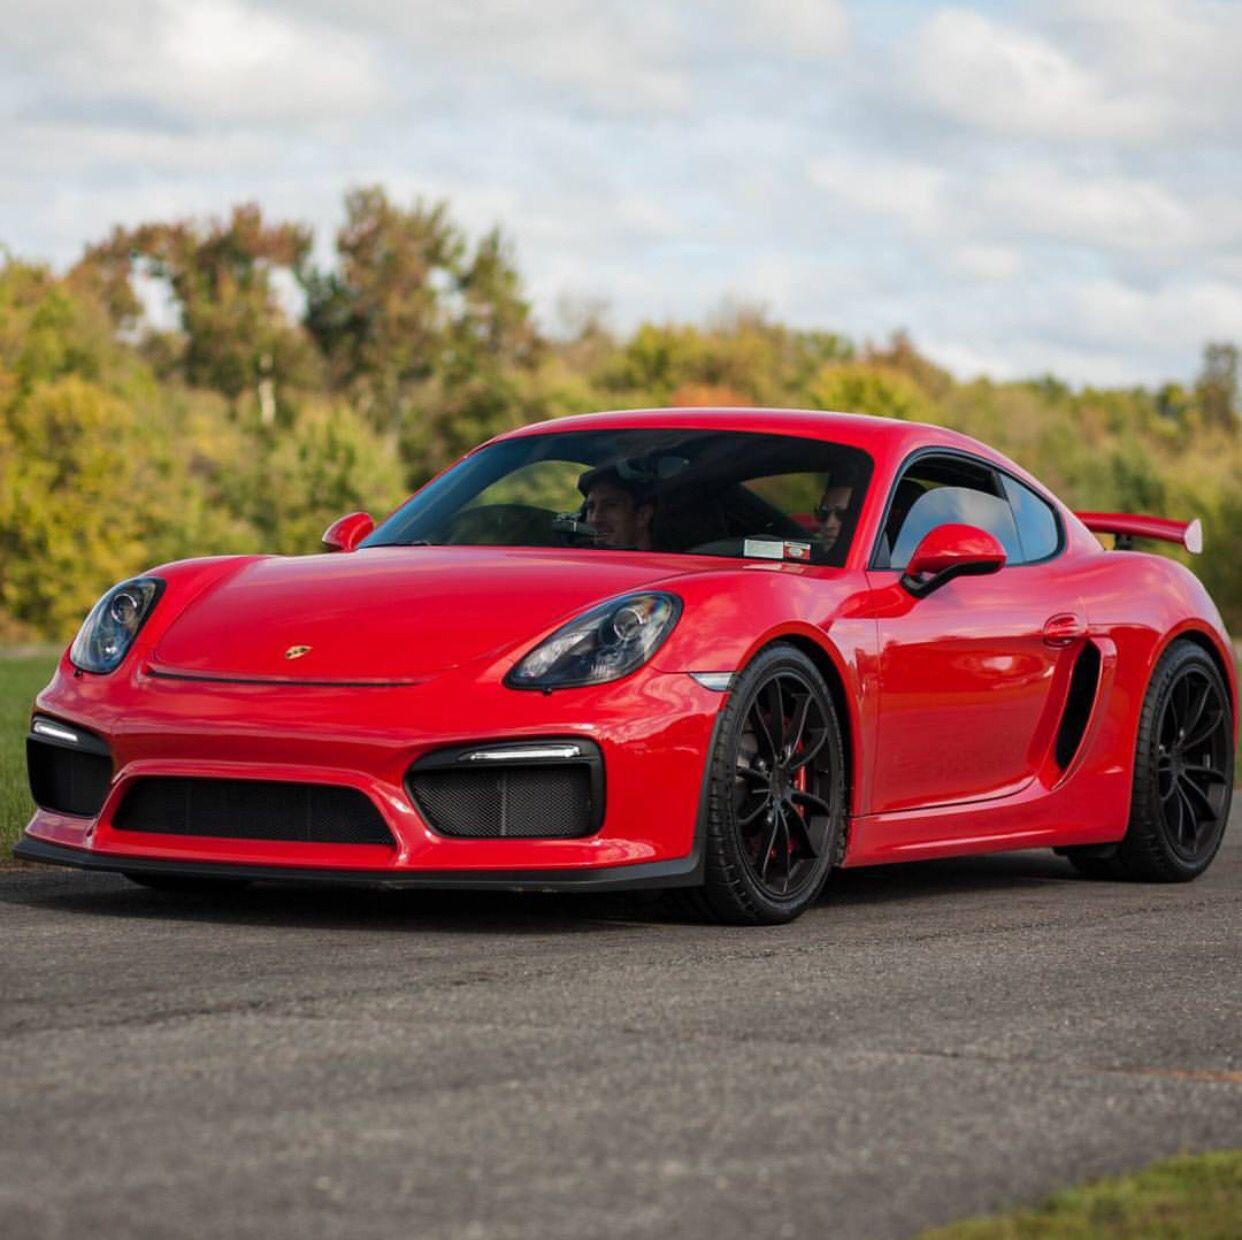 Porsche 911 Car: Porsche Cayman GT4 Painted In Guards Red Photo Taken By